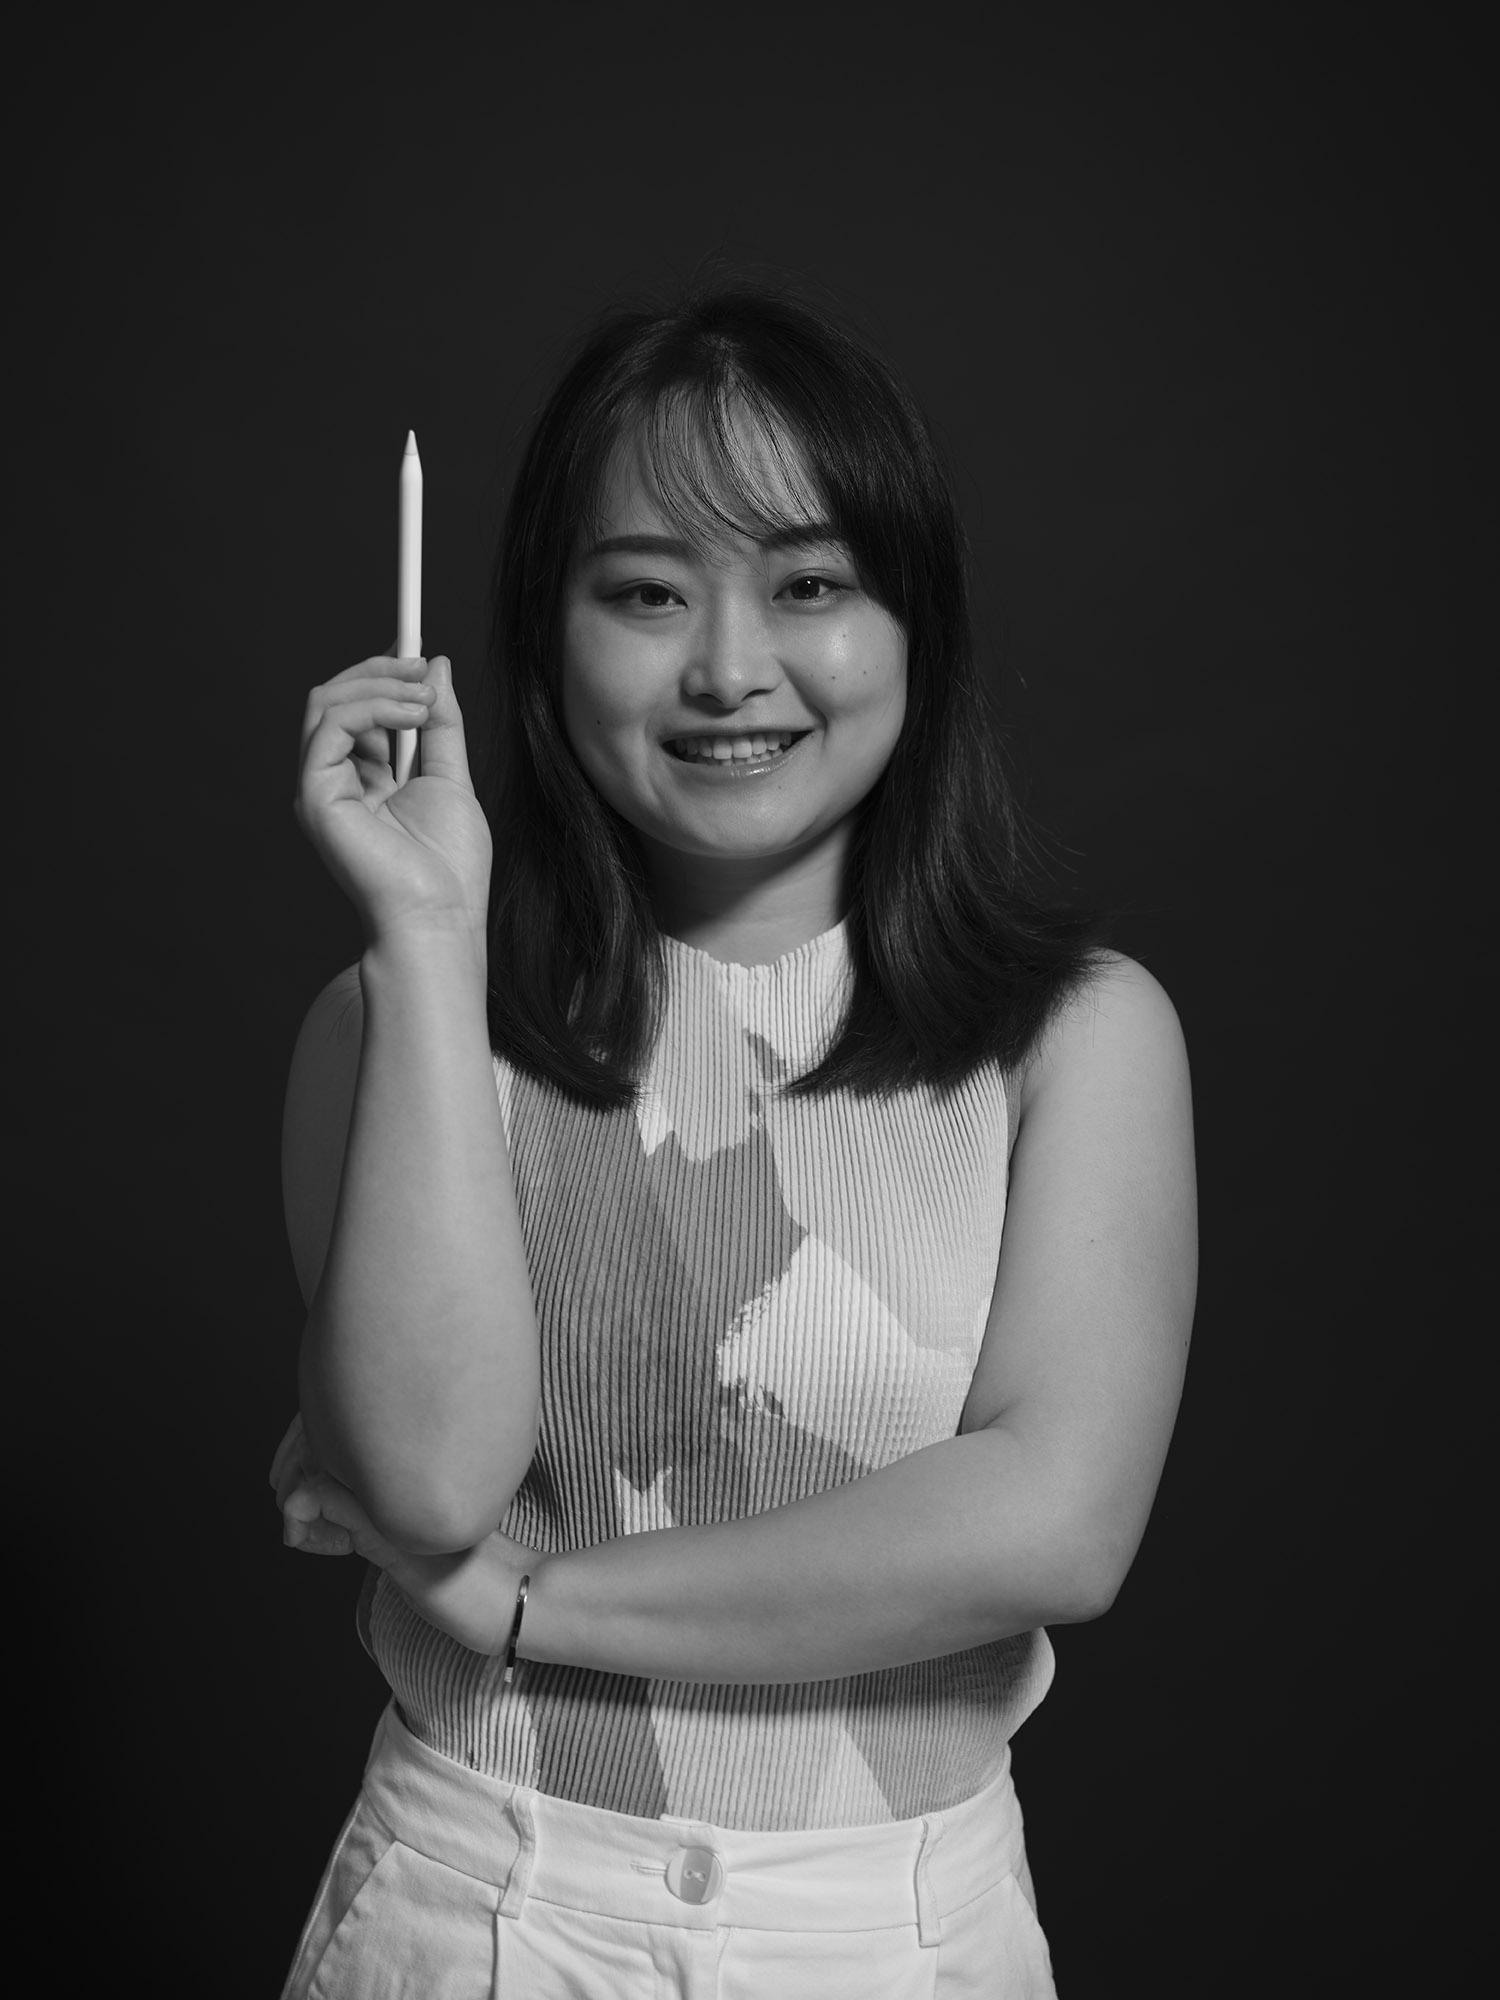 Ramboll Black and White Photography Portrait Photographer Singapore COCO Creative Studio 12